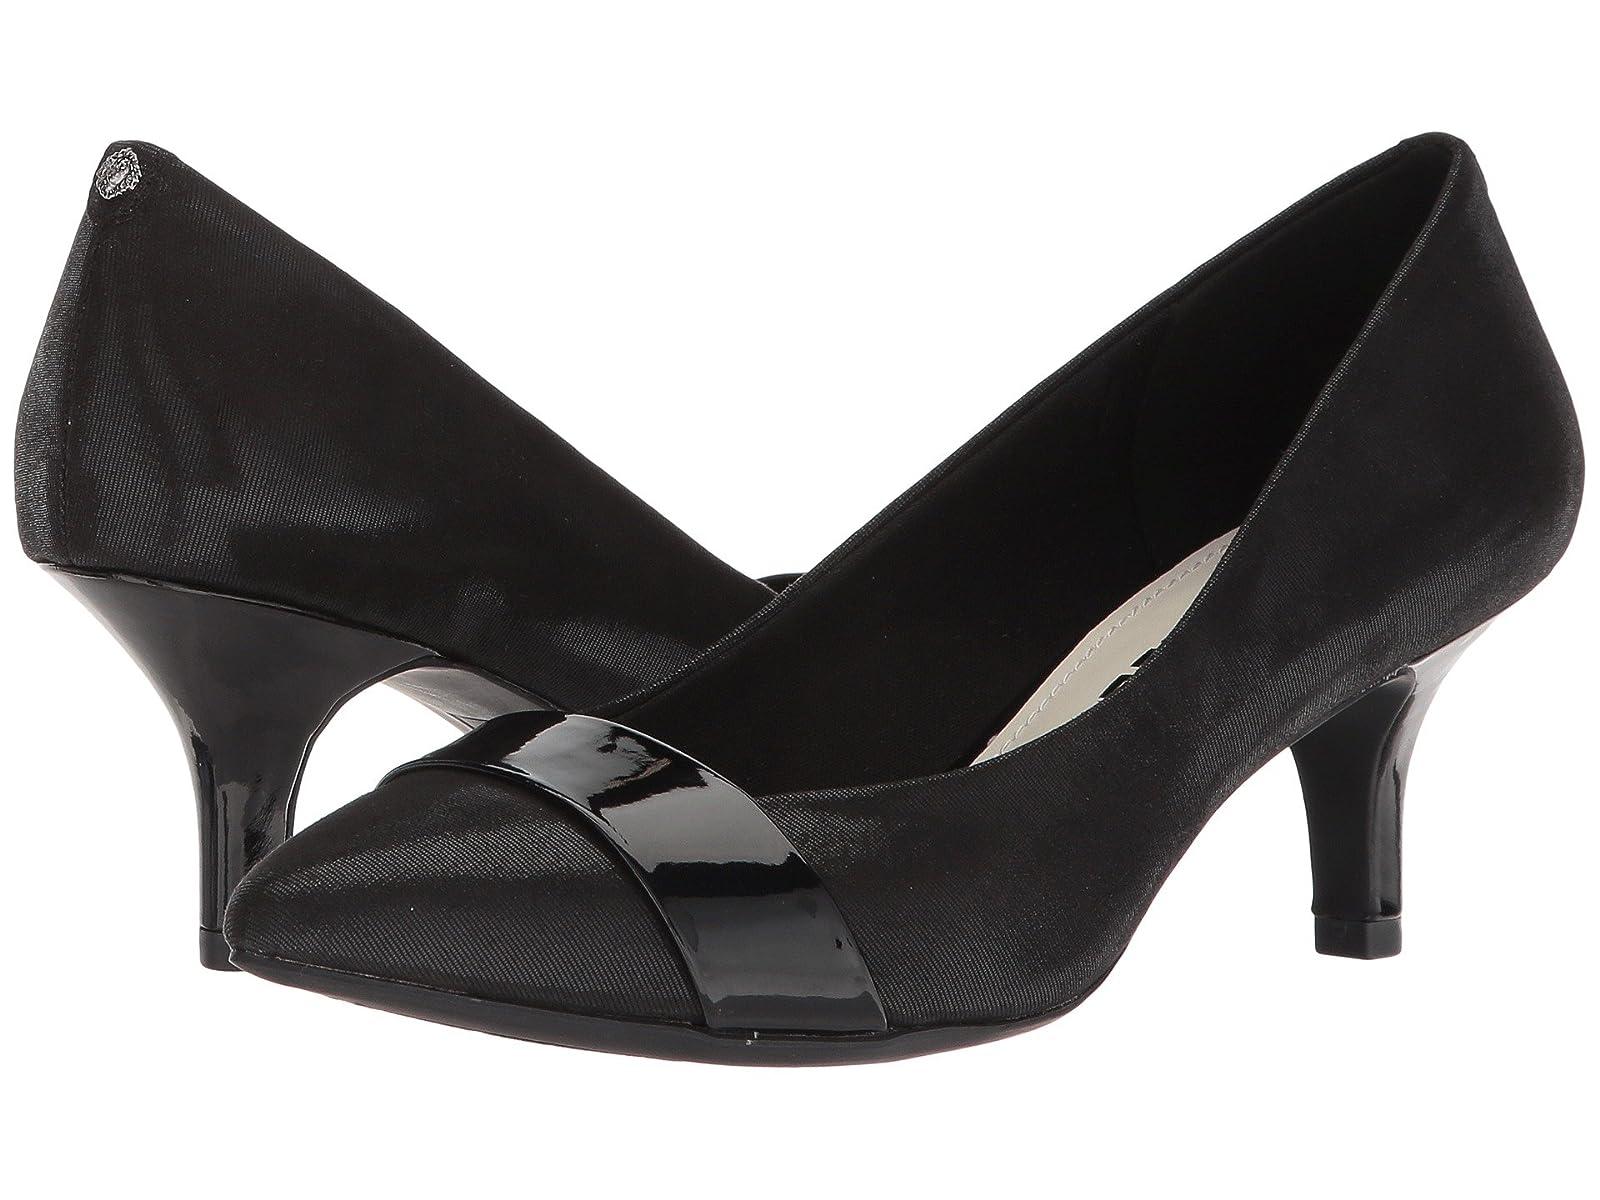 Anne Klein FerriAtmospheric grades have affordable shoes